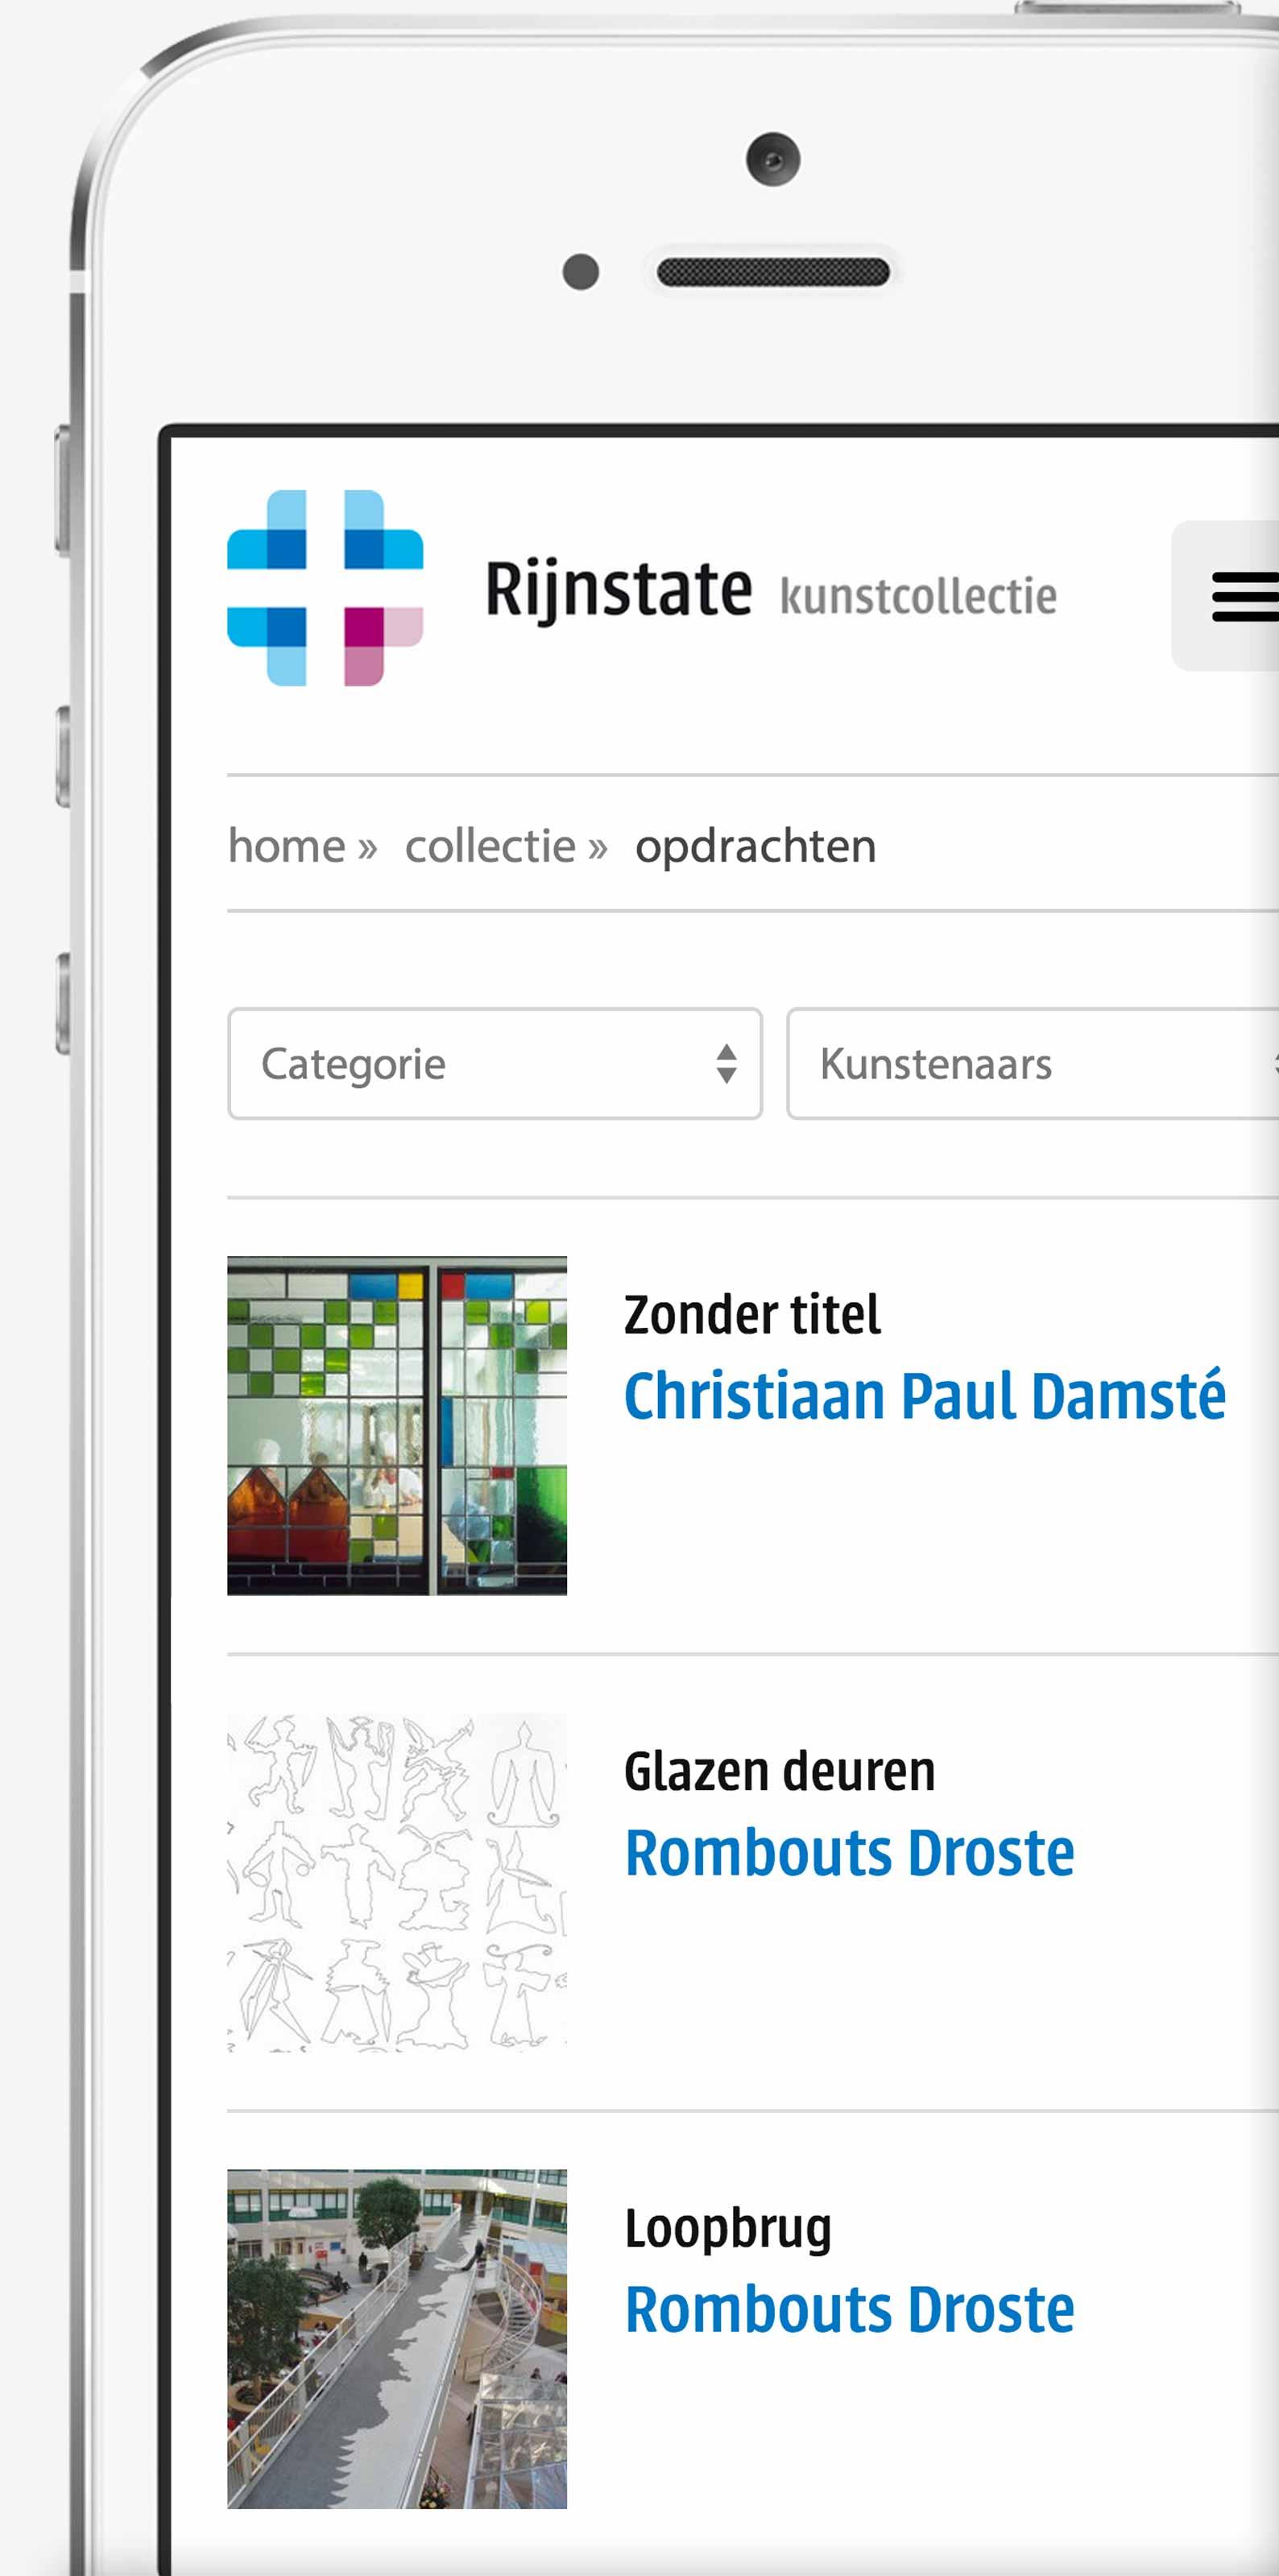 Rijnstate Kunstcollectie Mobile